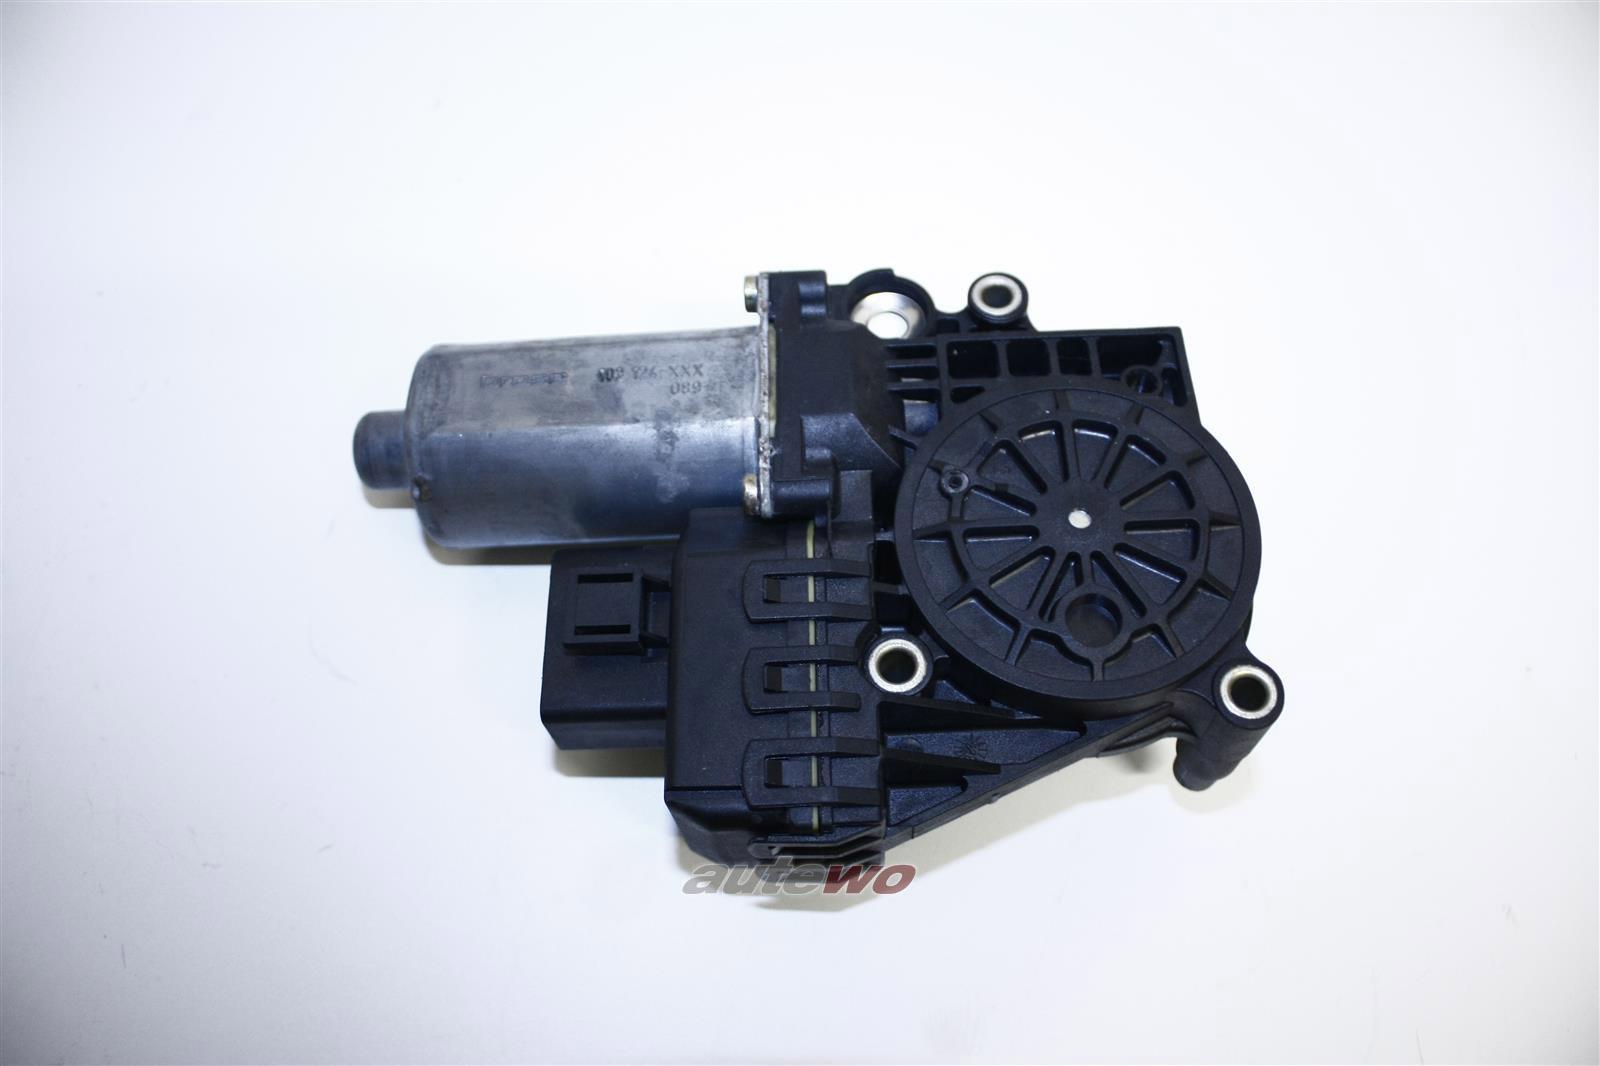 8D0959801F Bosch 0130821787 Audi A4/S4/RS4 B5 Fensterhebermotor VL